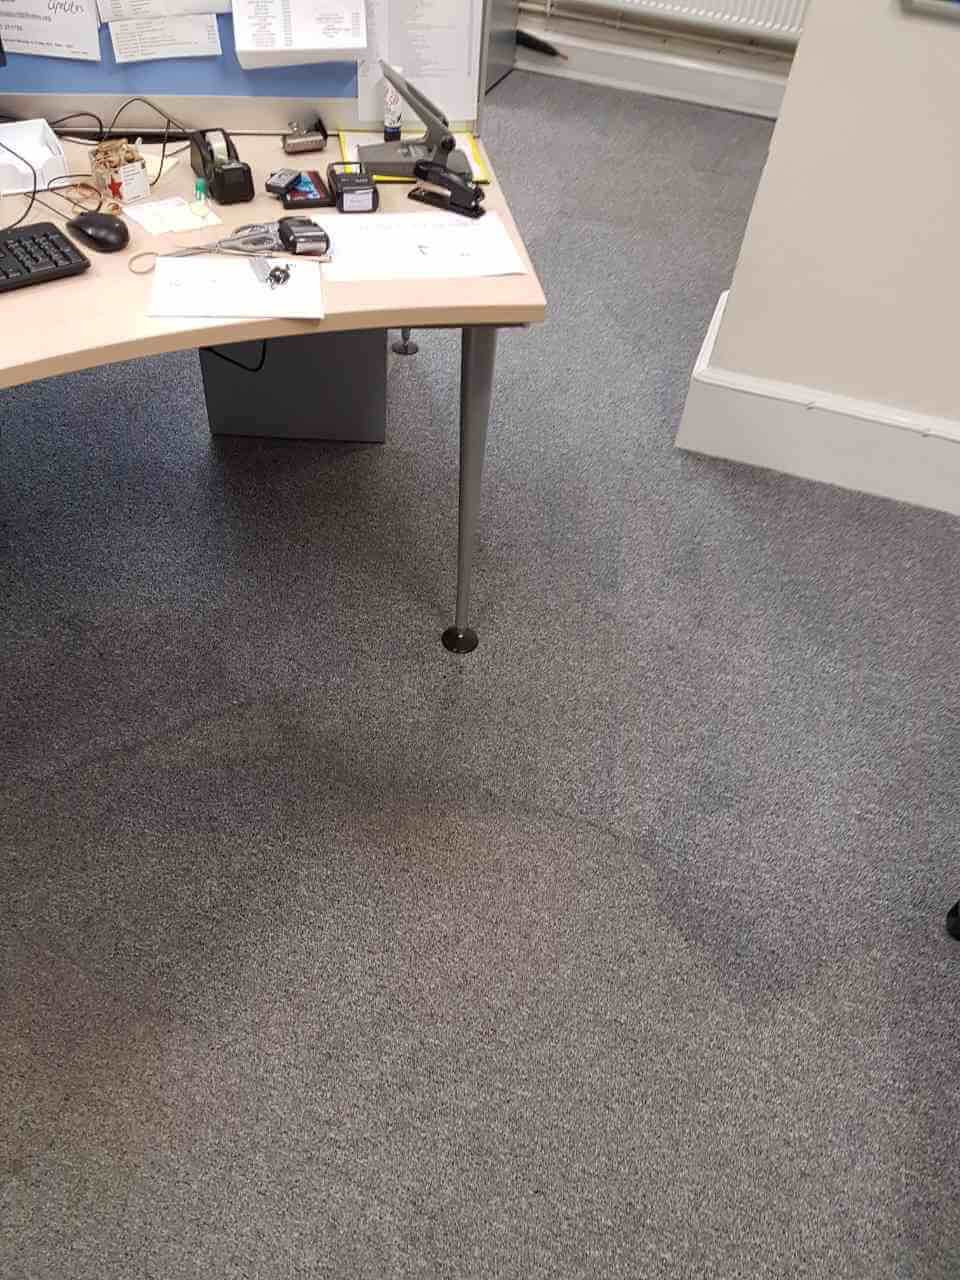 HA5 carpet cleaning